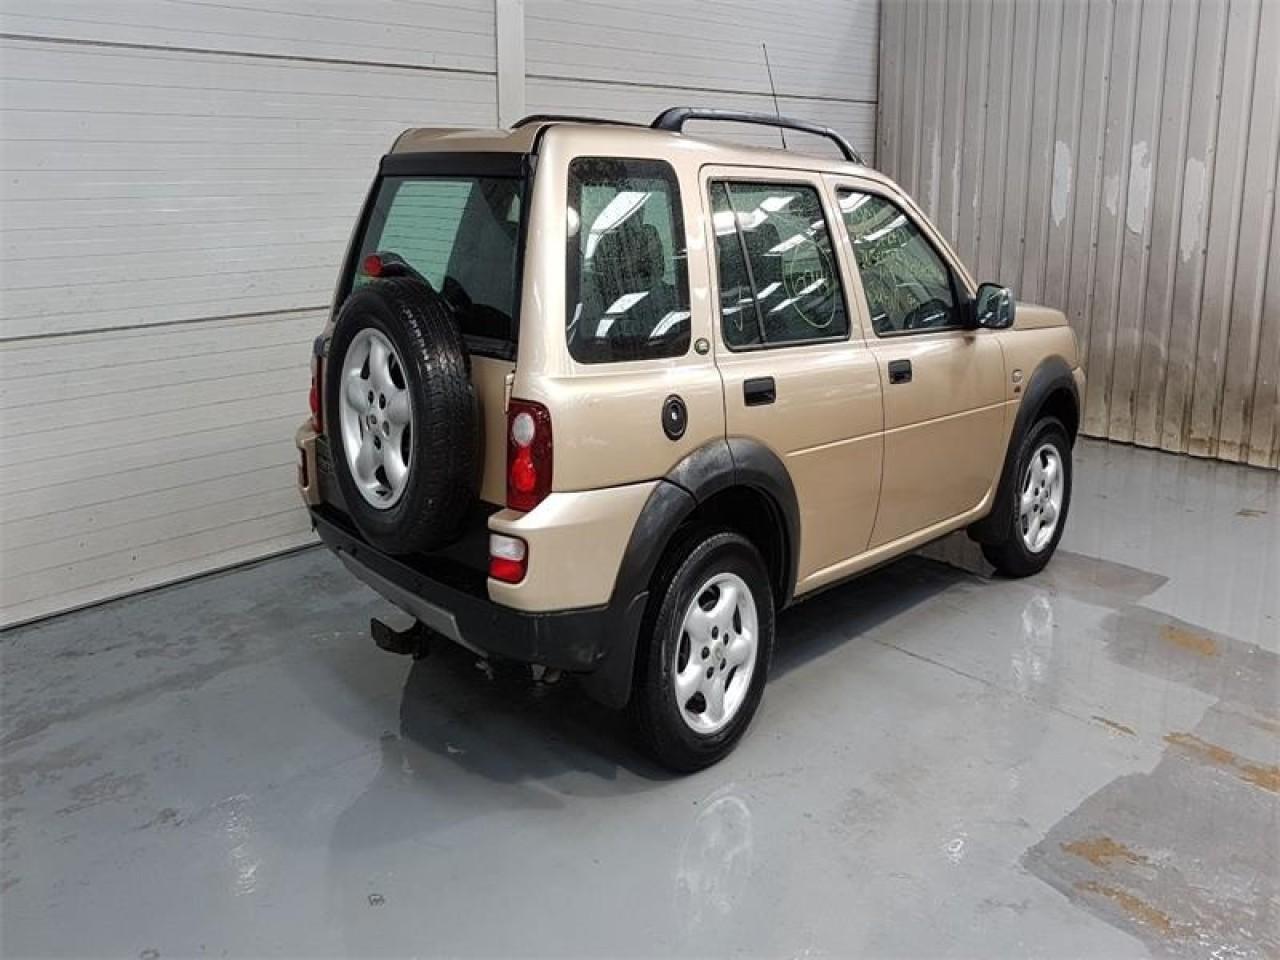 Fuzeta dreapta spate Land Rover Freelander 2005 SUV 2.0 D